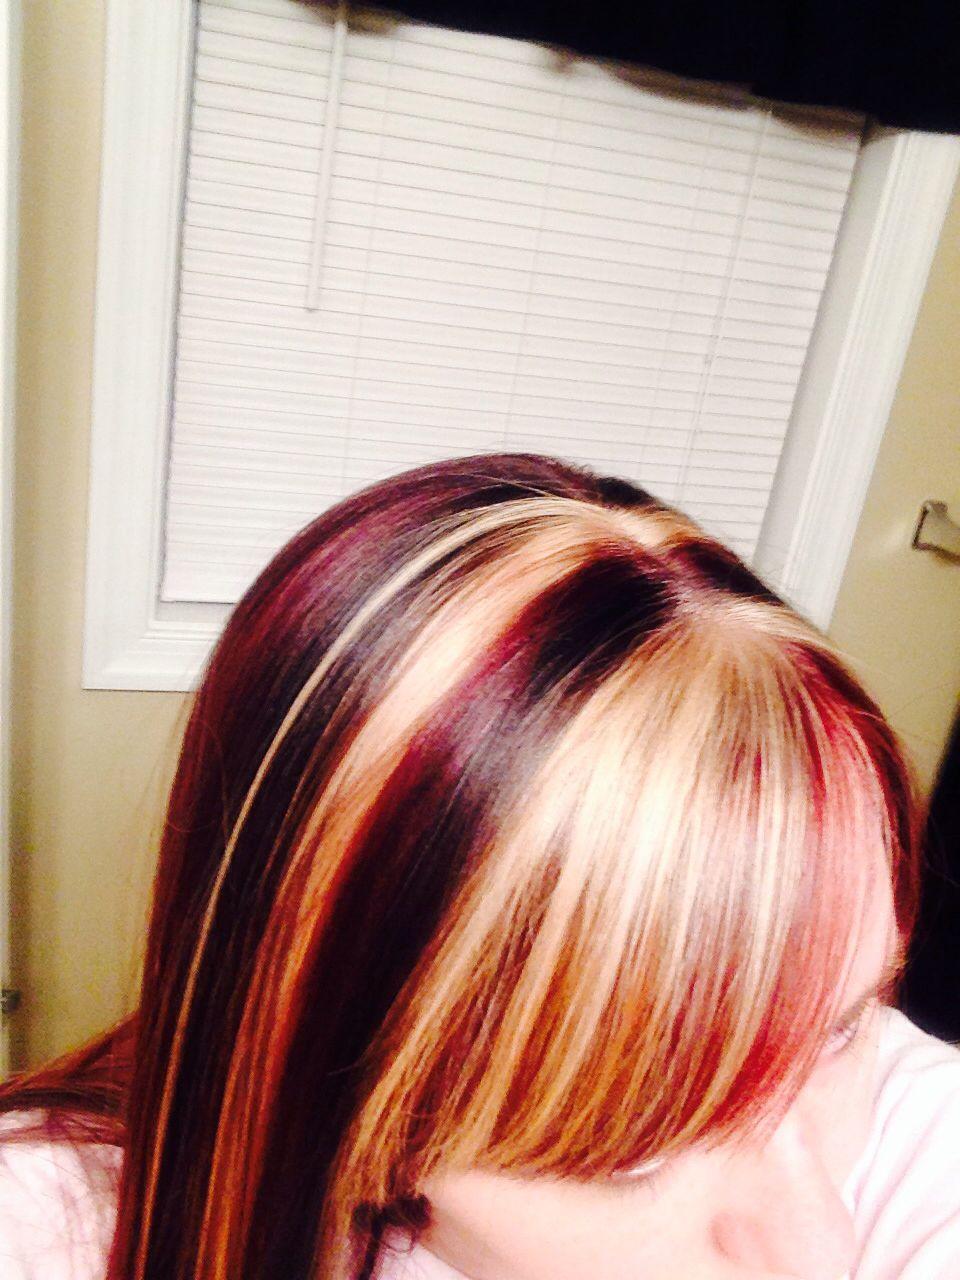 Cherry coke highlights Hair color cherry coke, Hair